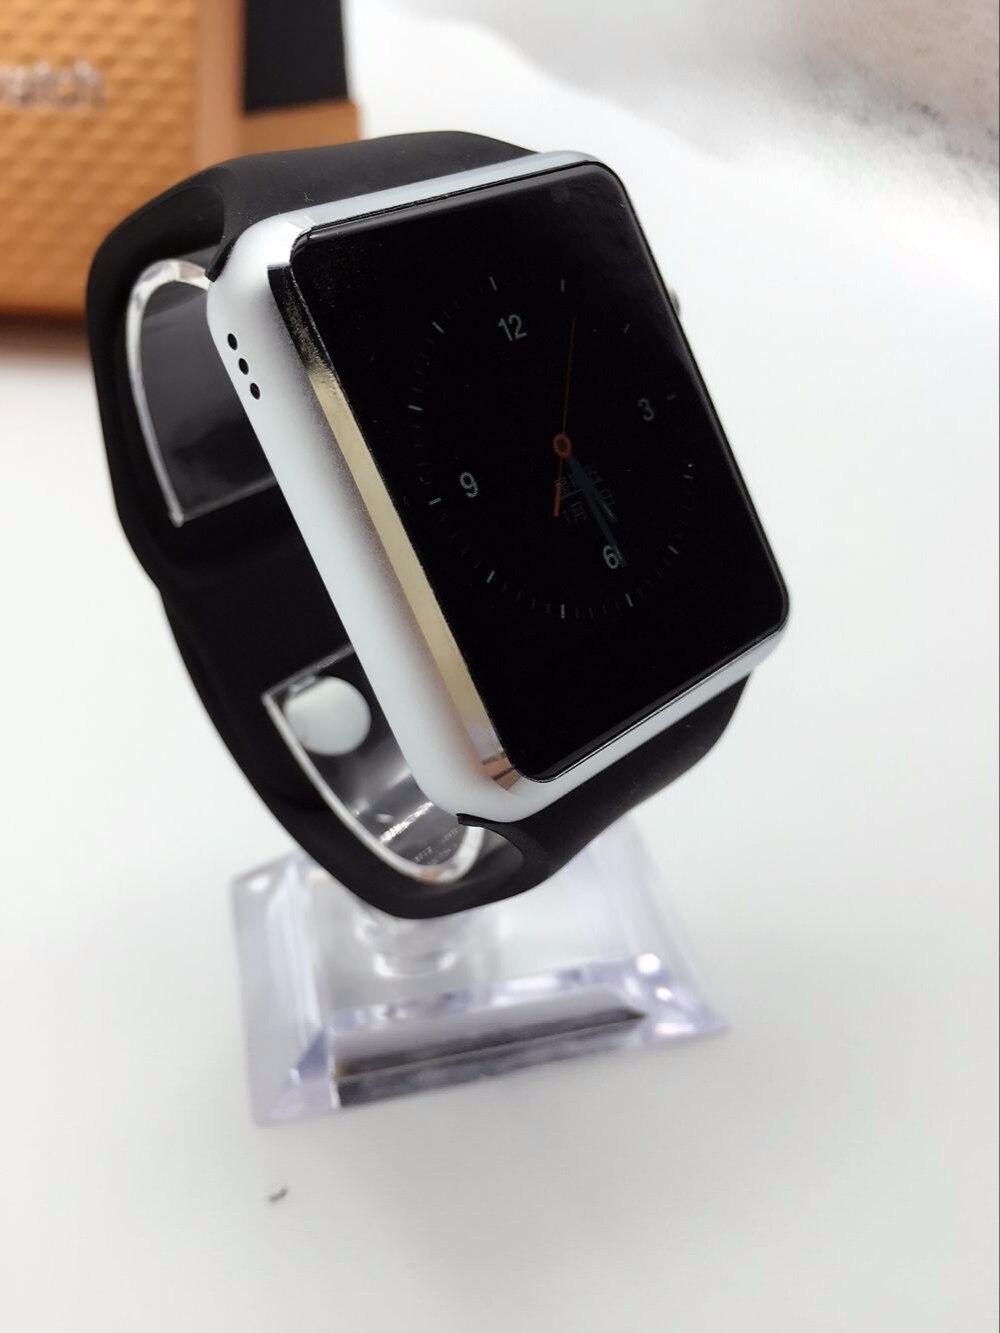 X8 GPS Smart Watch Android 3g smart watch phone with gps Bluetooth watch camera PK U8/GT09/DZ08 adult smart watch phone for men 3g android watch with gps google play bluetooth men watch camera pk gt08 smart watch